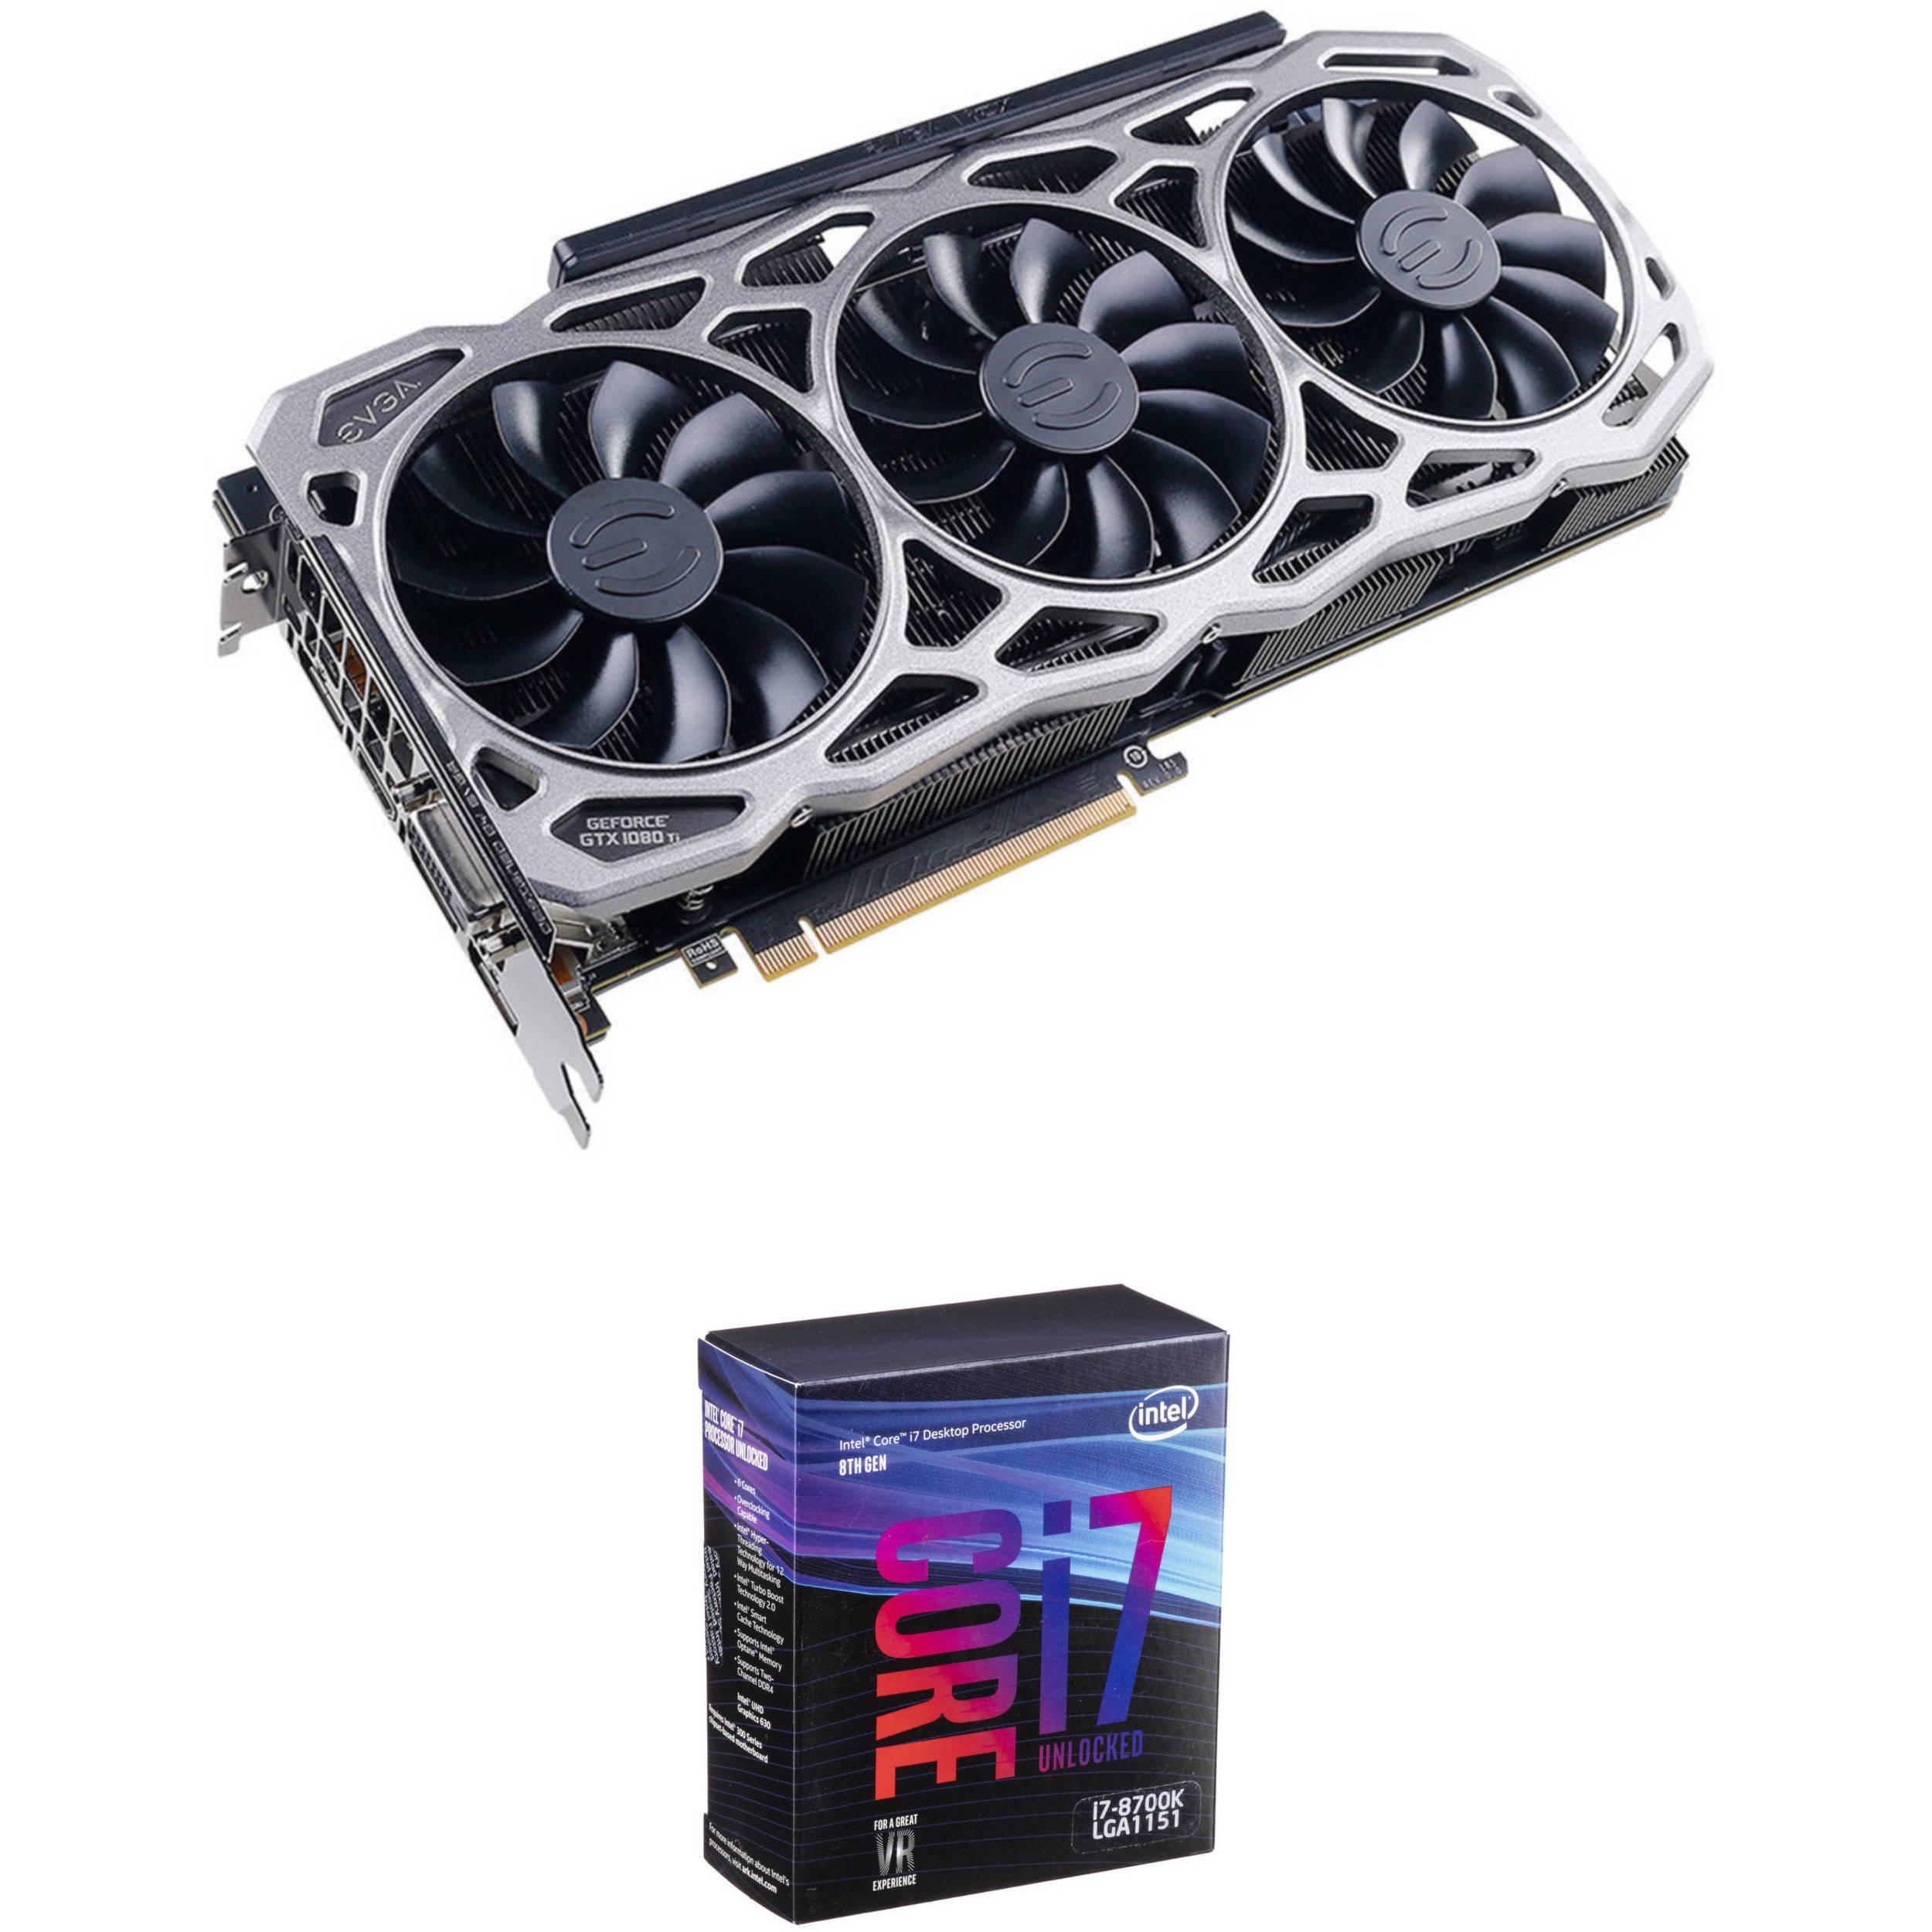 EVGA GeForce GTX 1080 Ti FTW3 GAMING Graphics Card & Intel Core i7-8700K  6-Core Processor Kit